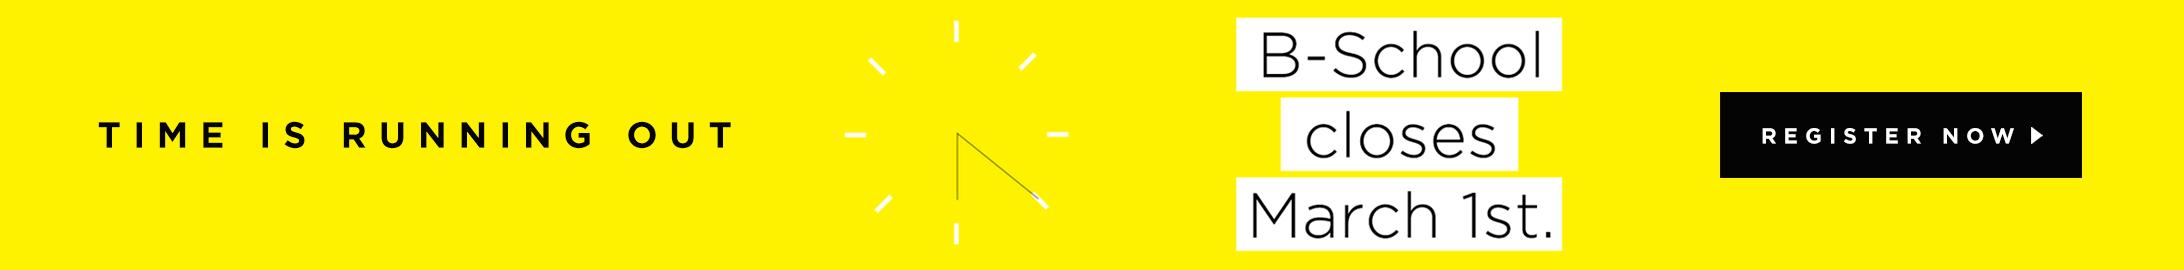 6_TimeIsRunningOut_Horizontal-(Clock).png